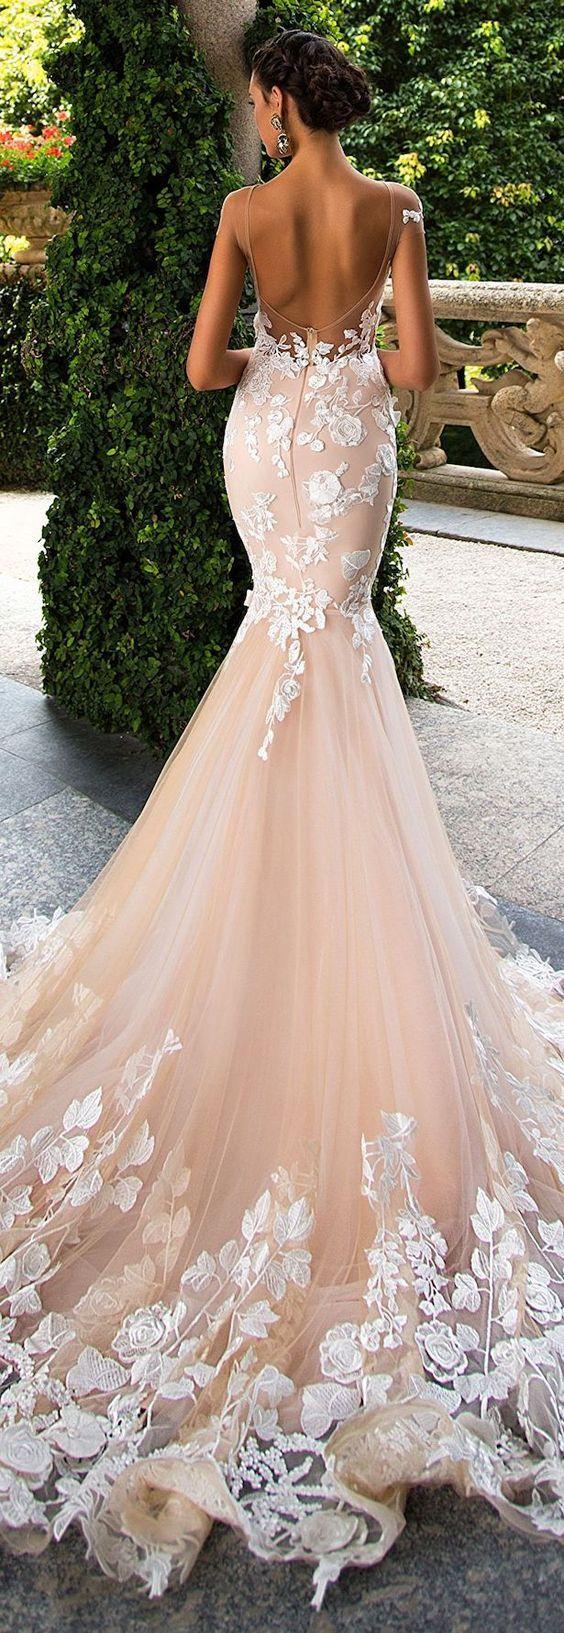 Wedding Dresses 37 07082017 Km Modwedding Wedding Dresses Dusty Pink Bridesmaid Dresses Wedding Dresses Lace [ 1633 x 564 Pixel ]